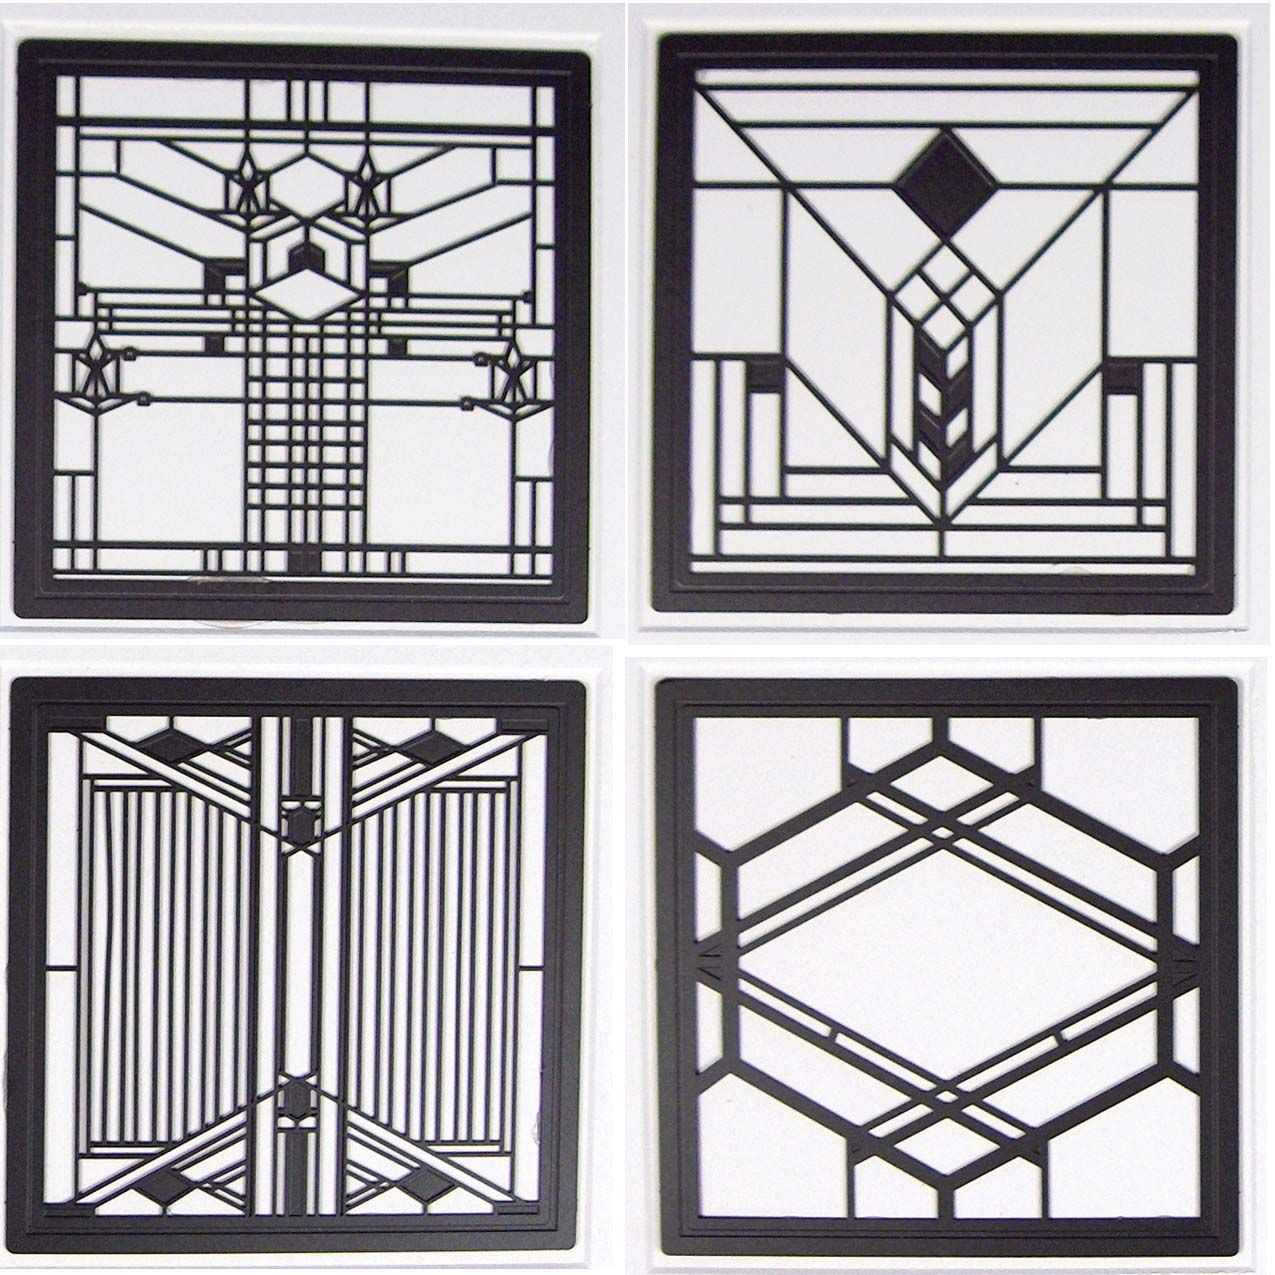 Hindostone Products Coasterstone Fwas600 Frank Lloyd Wright